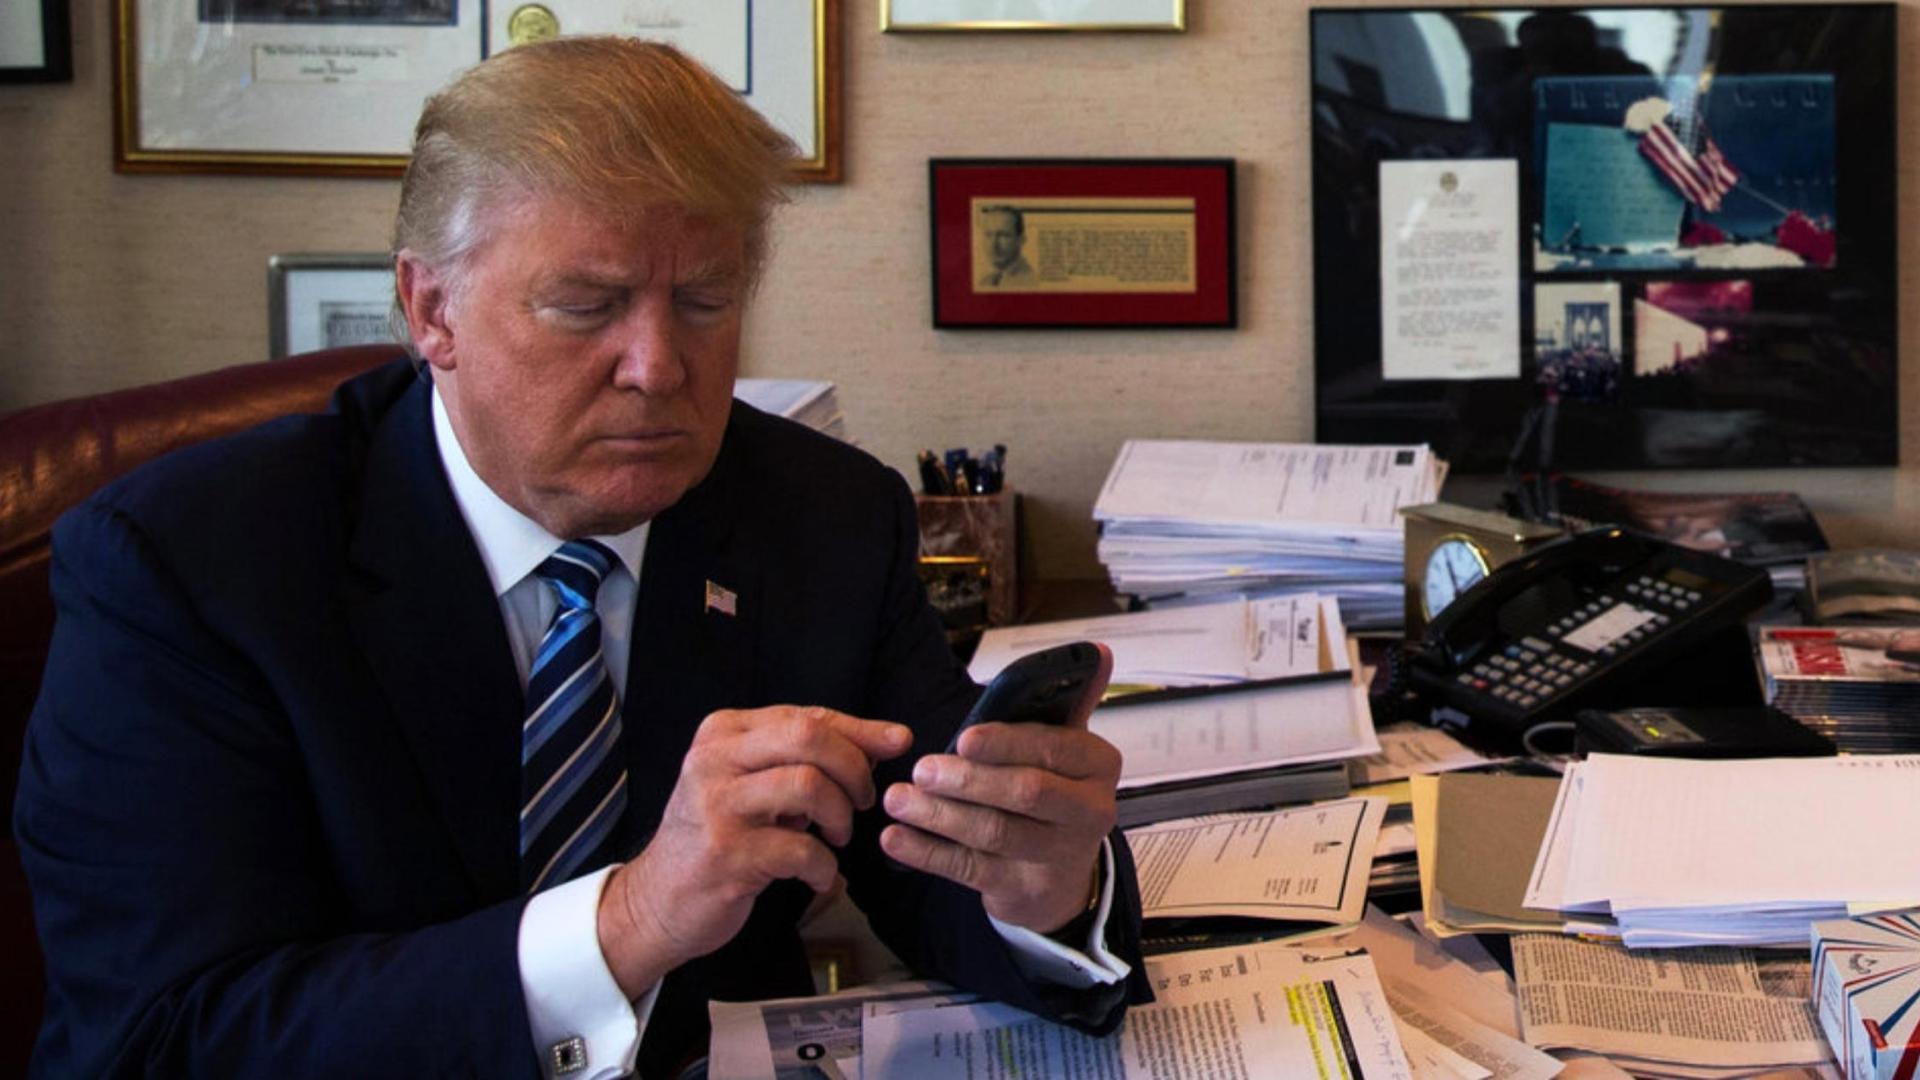 Alisyn Camerota Nude cnn dedicates entire segment to trump's personal cell phone use